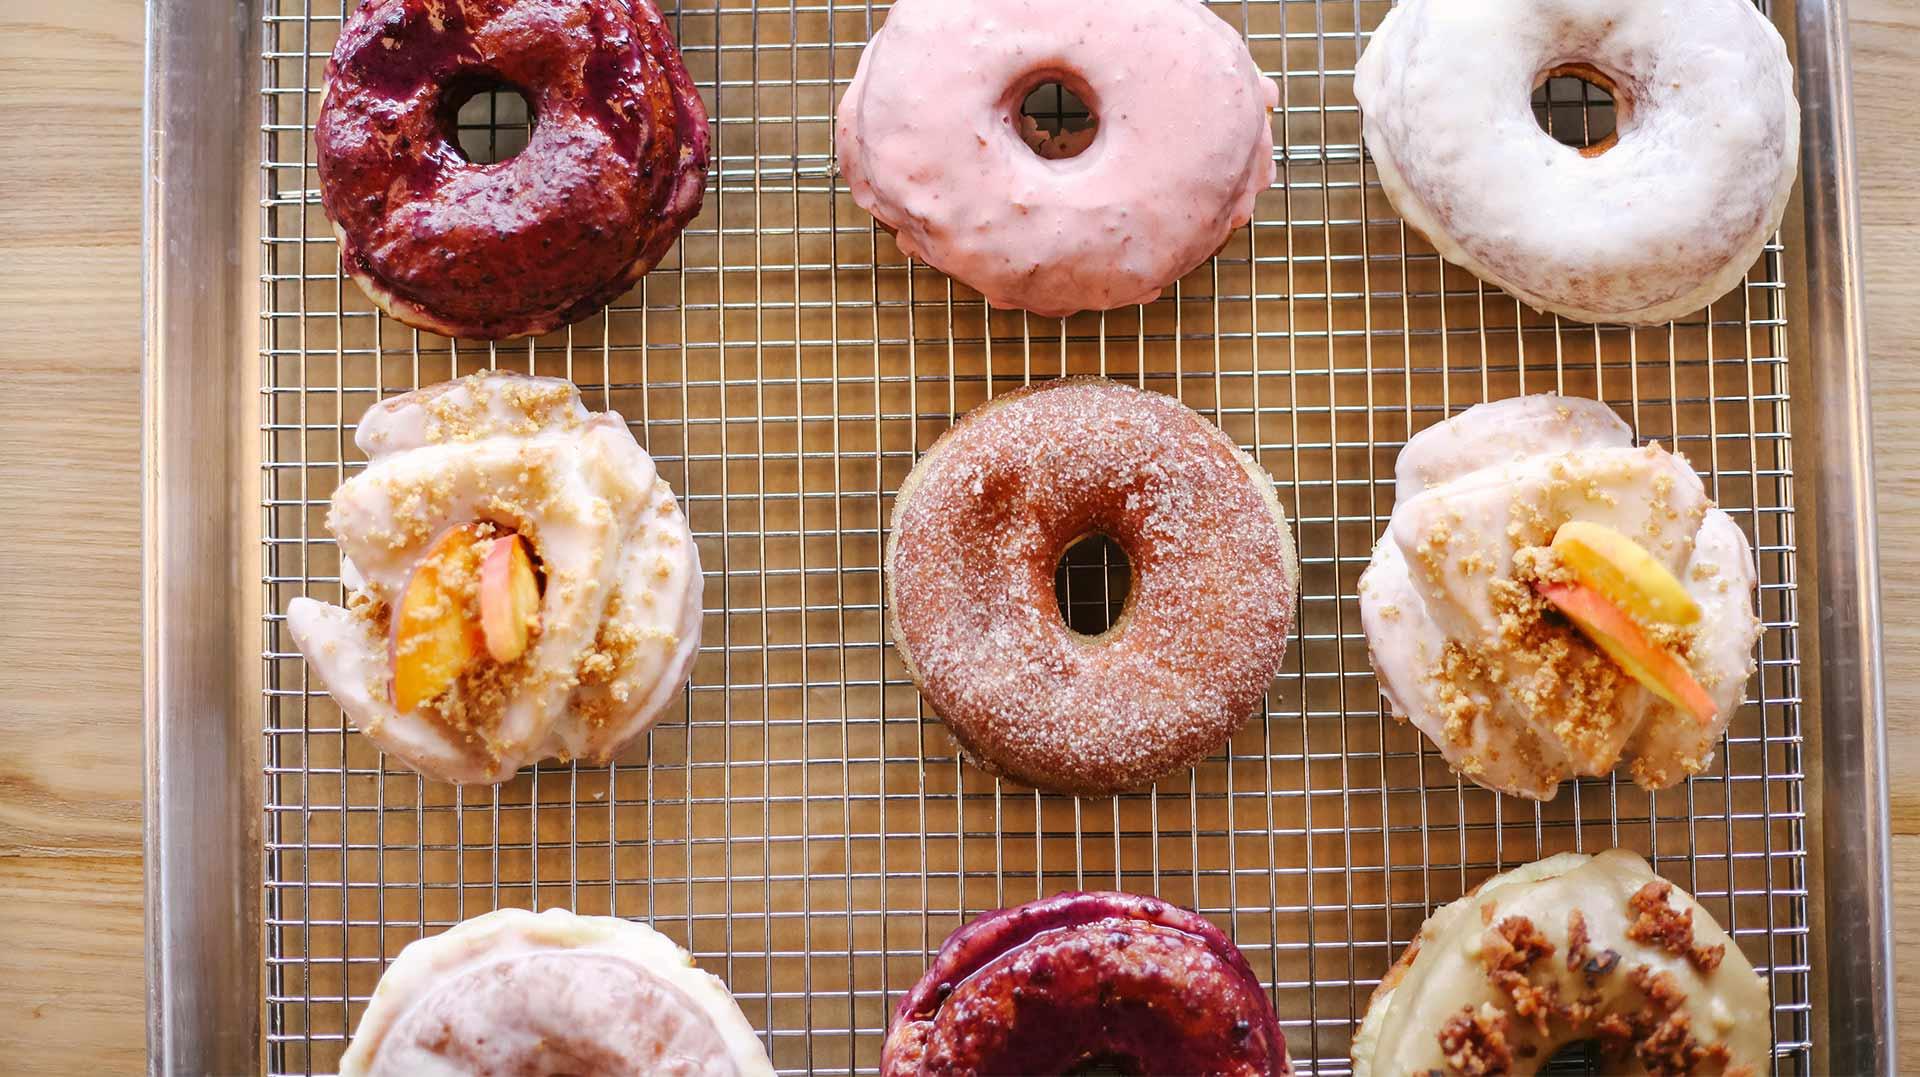 The Best Doughnut Shops in Melbourne